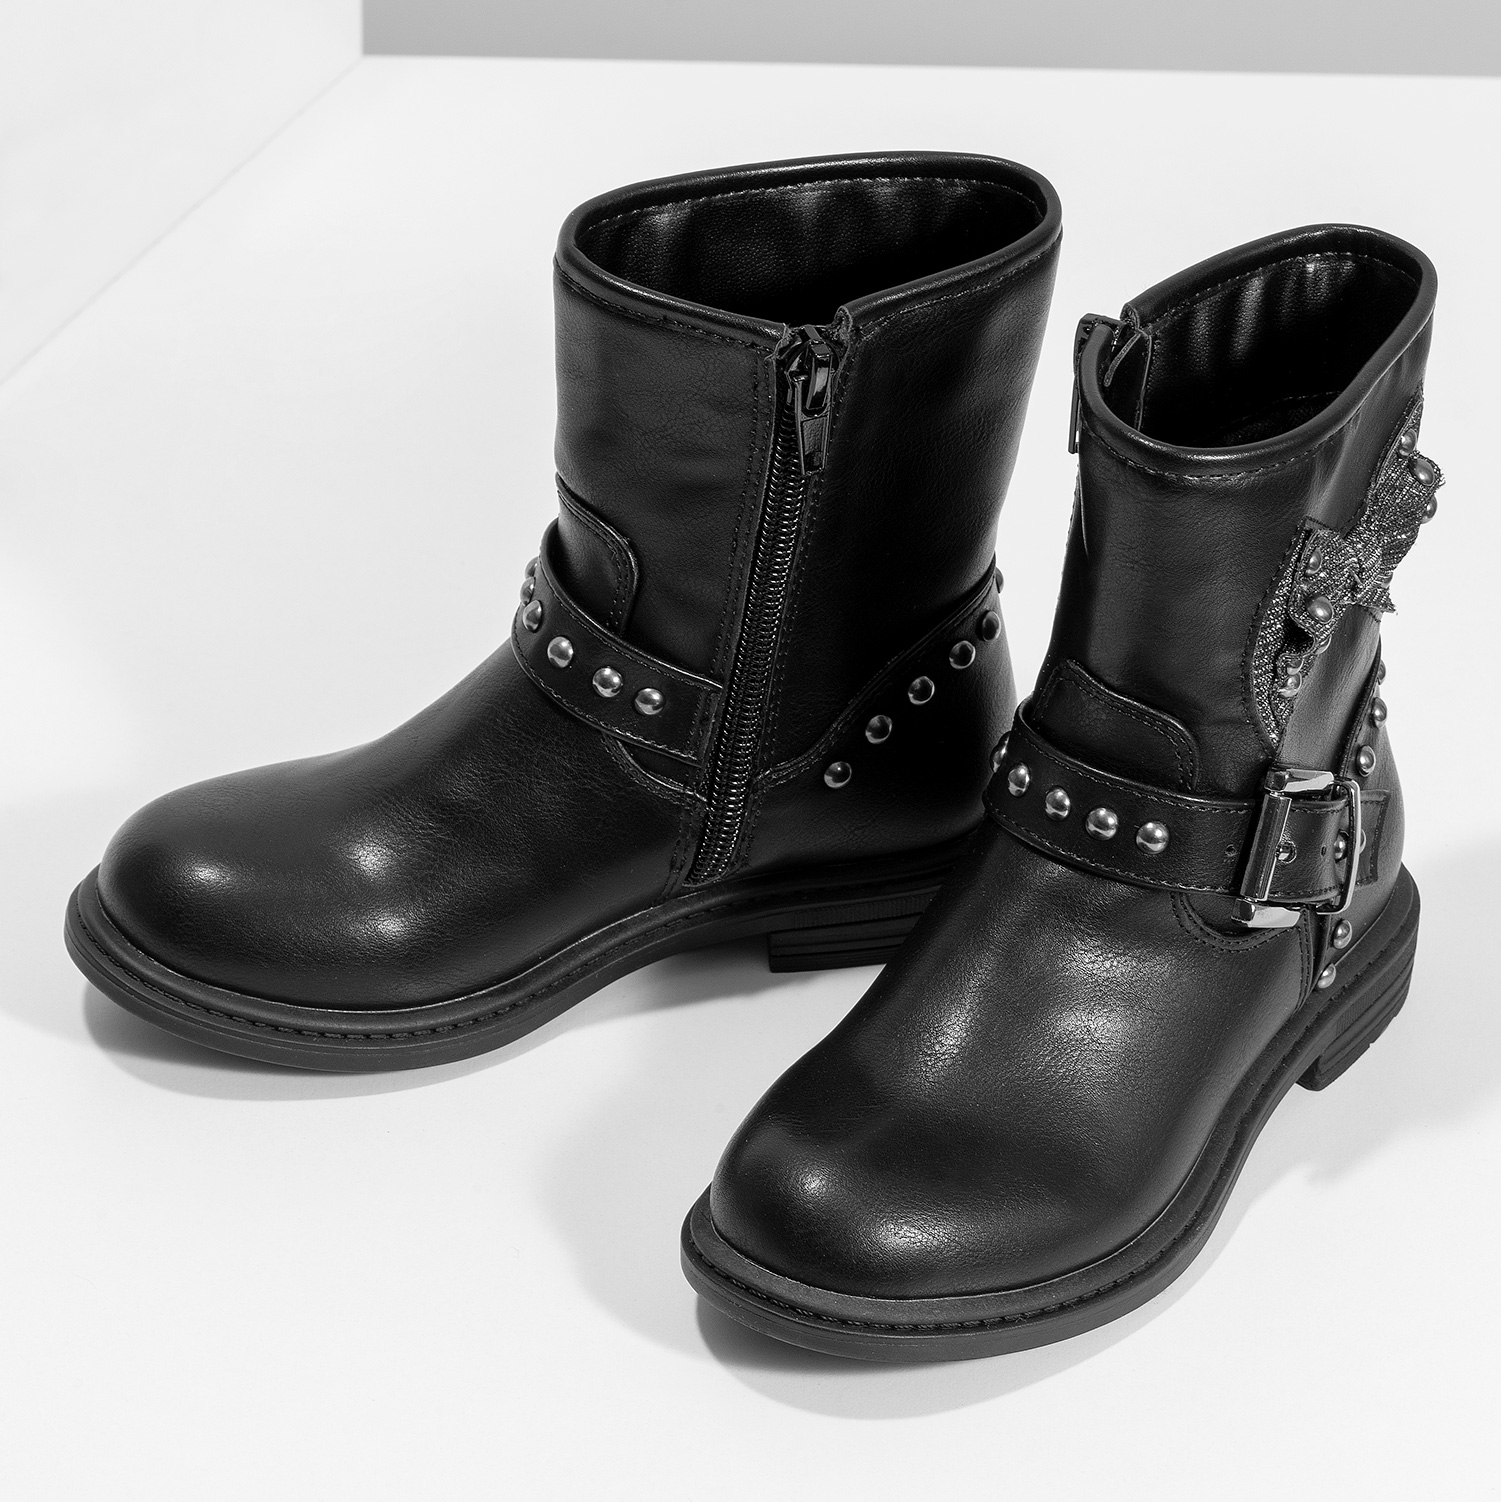 Mini B Detské čierne čižmy s mašľou - Mini B  a07c07c5ca7